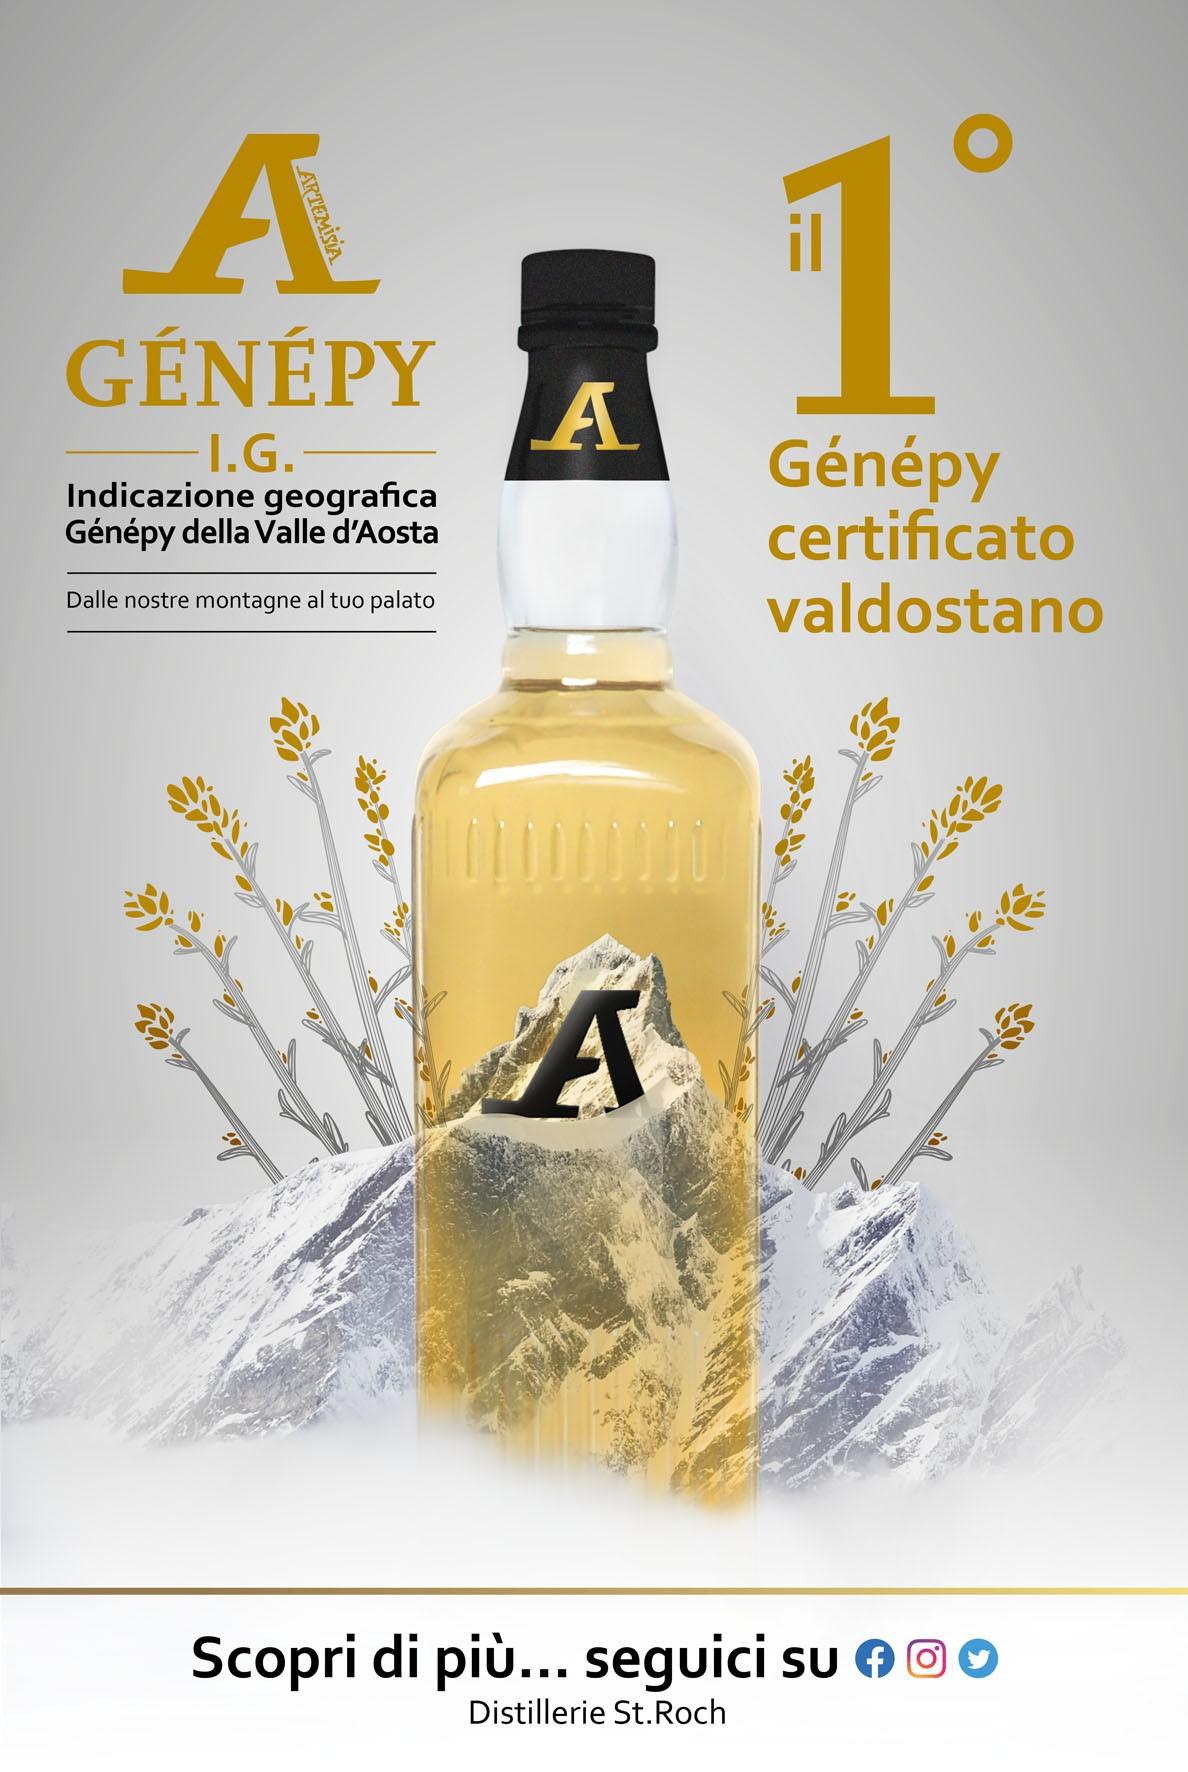 Sbarca sul mercato A Artemisia Génépy, il primo Génépy certificato IG